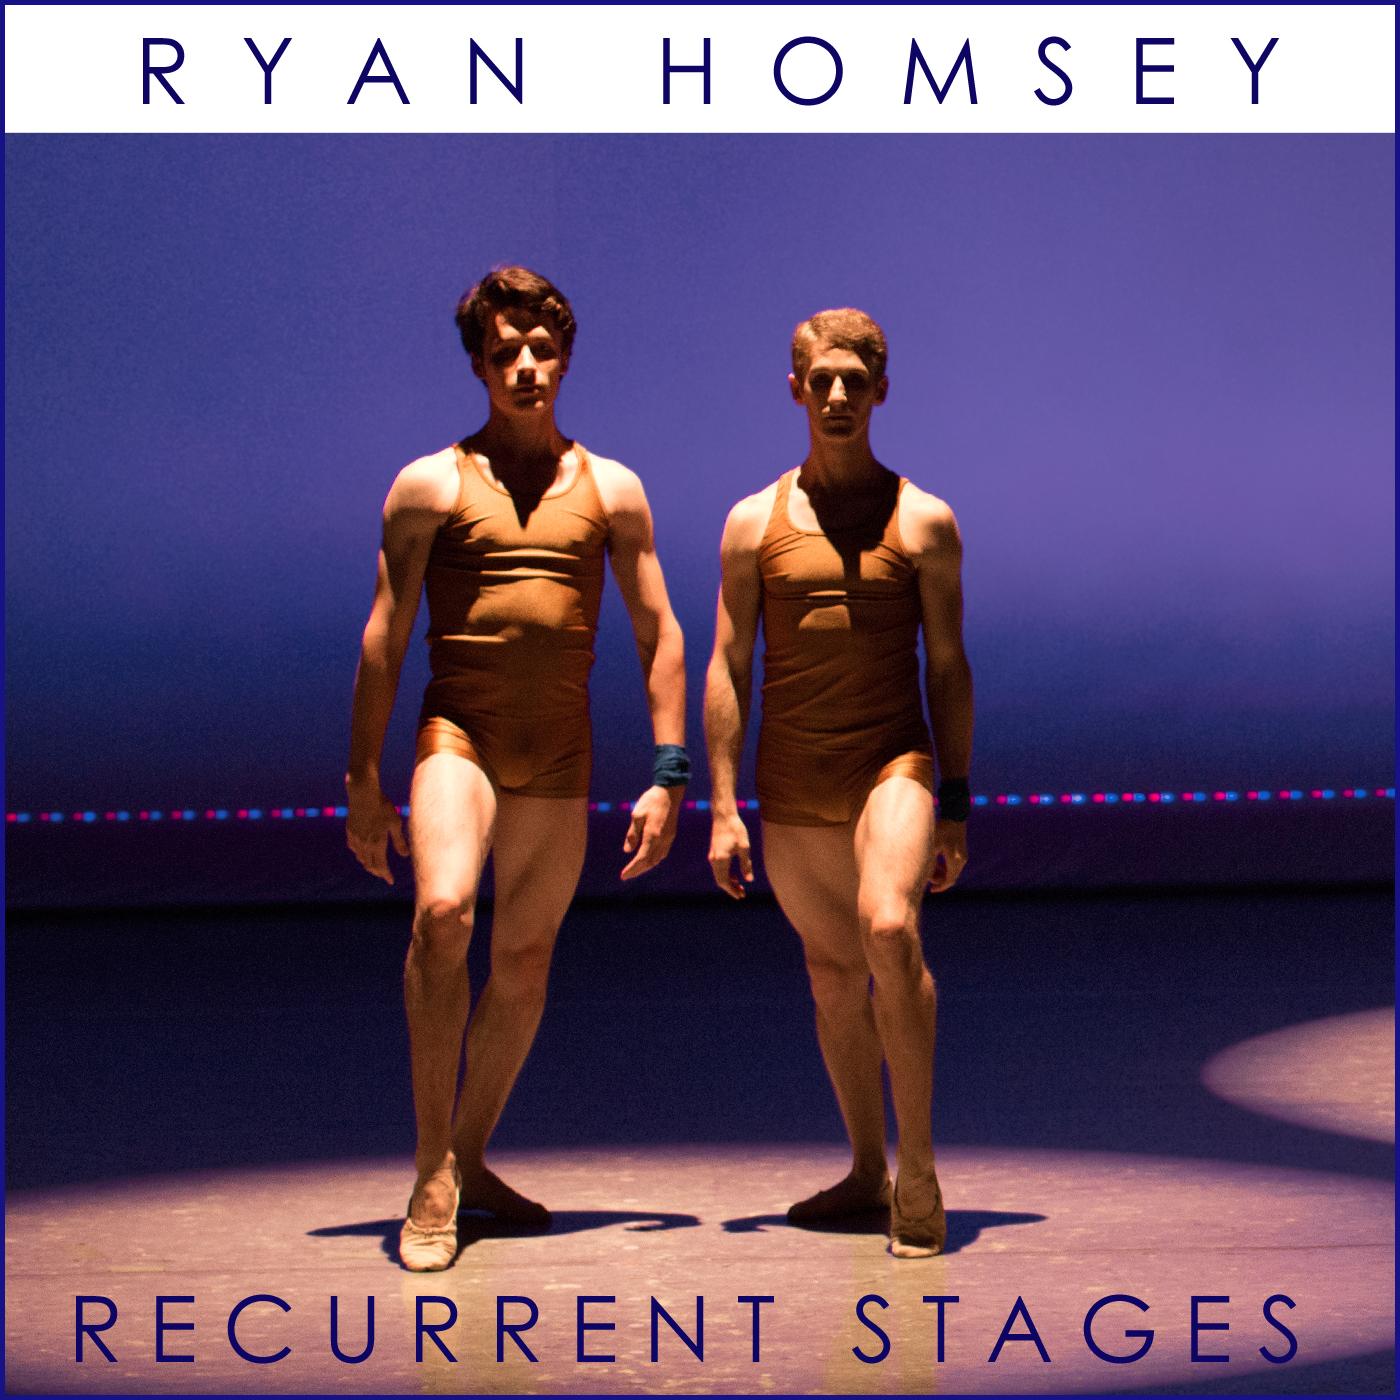 recurrent-stages-album-cover.jpg